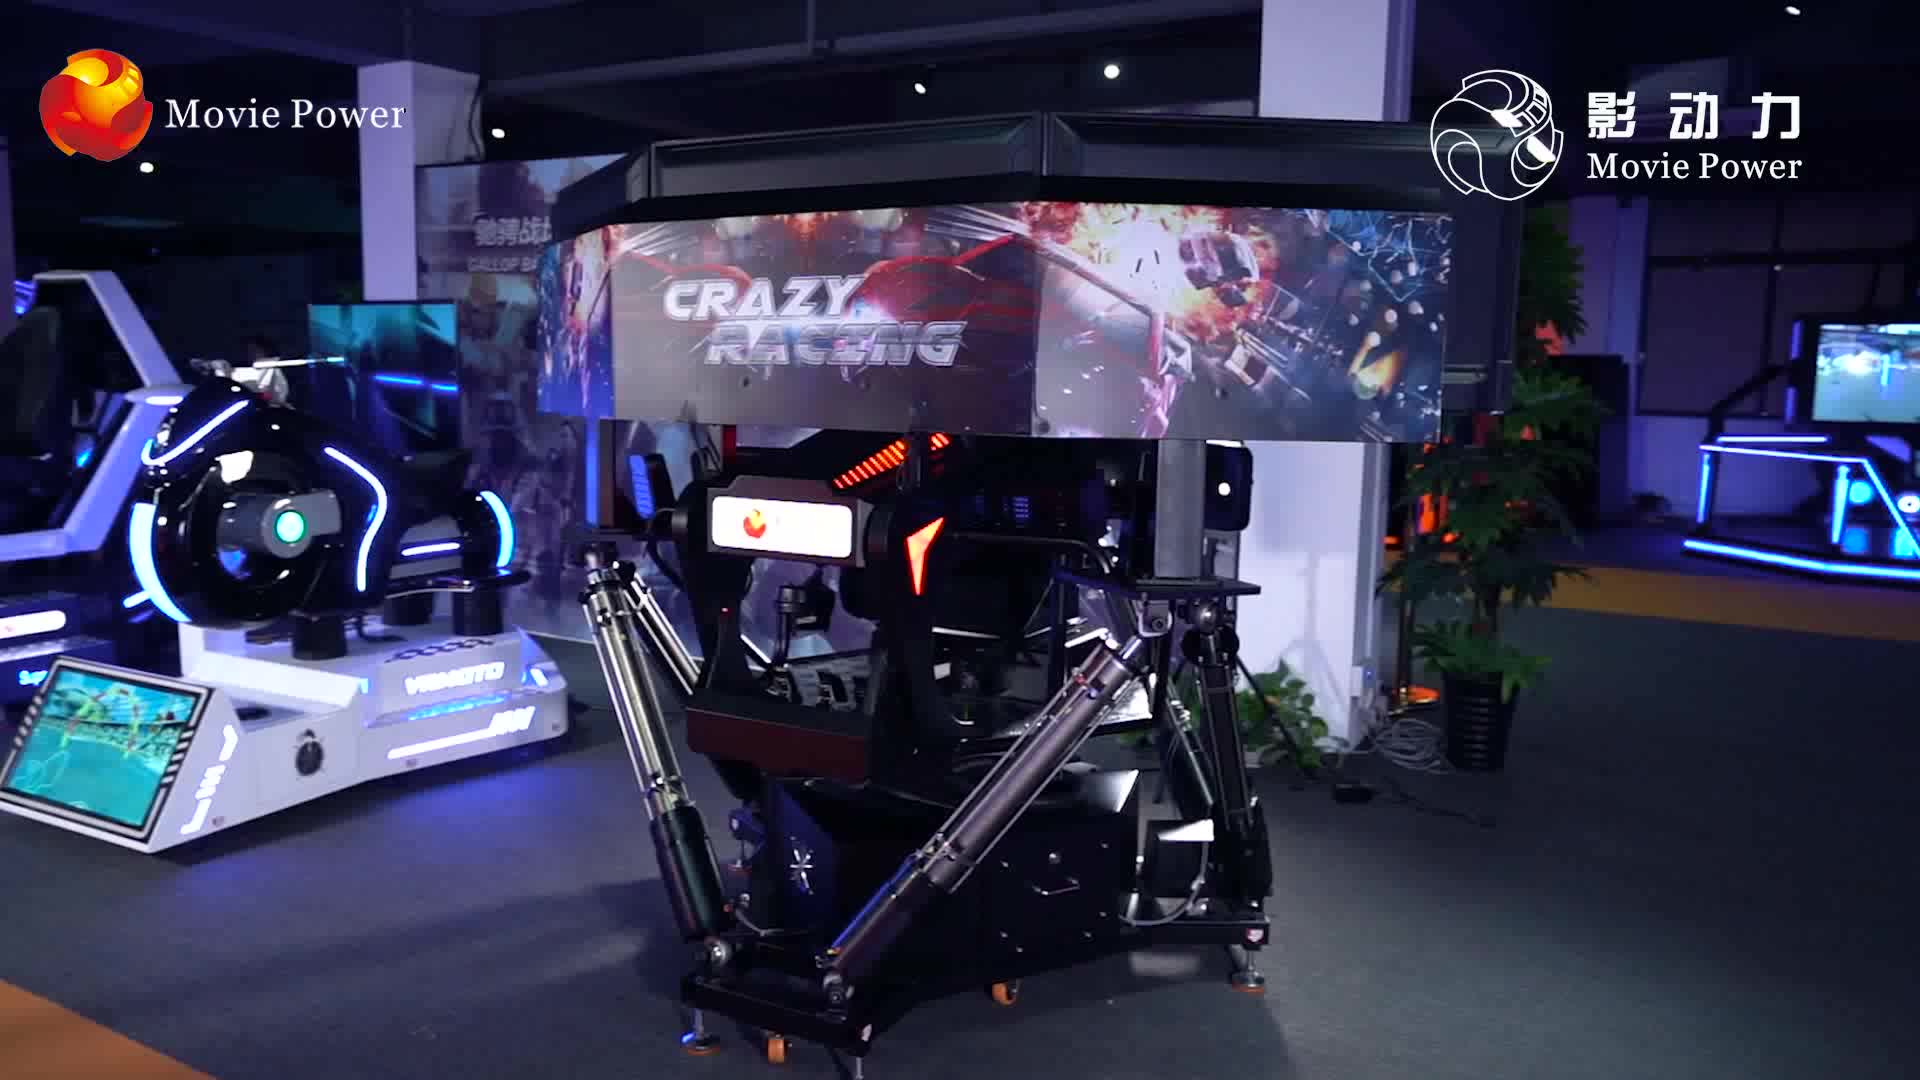 Indoor Sport 4d racing bewegung sitze simulator Unterhaltung Spiele Auto Racing Sitz Simulator 5d auto fahren simulator mit 3 bildschirme